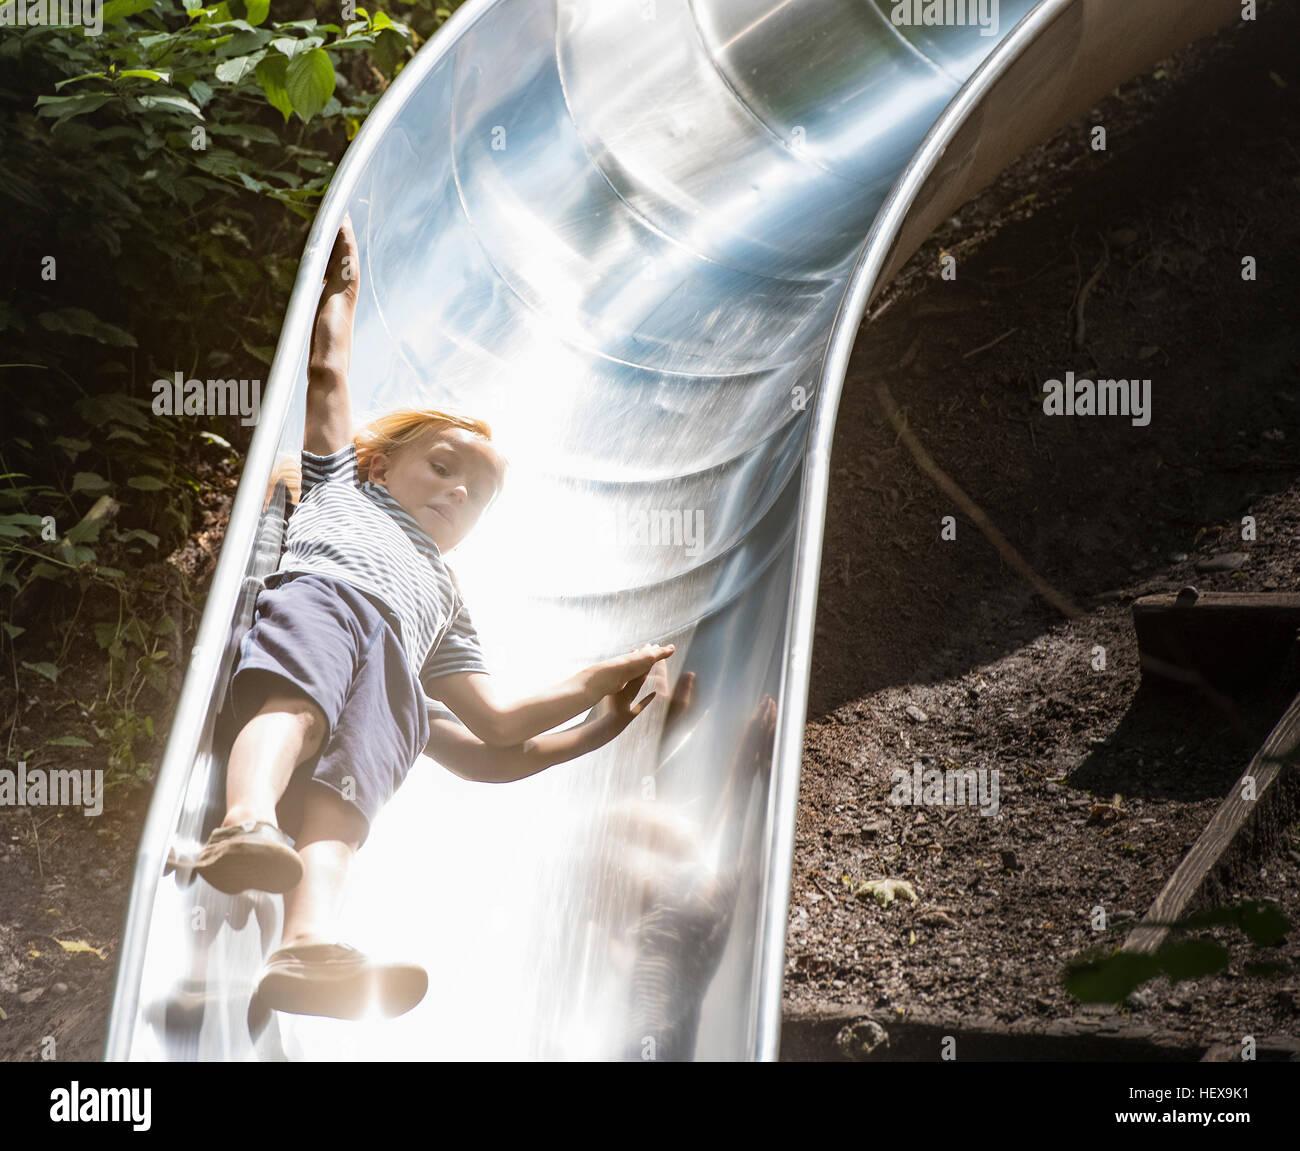 Chico bajando playground diapositiva Imagen De Stock